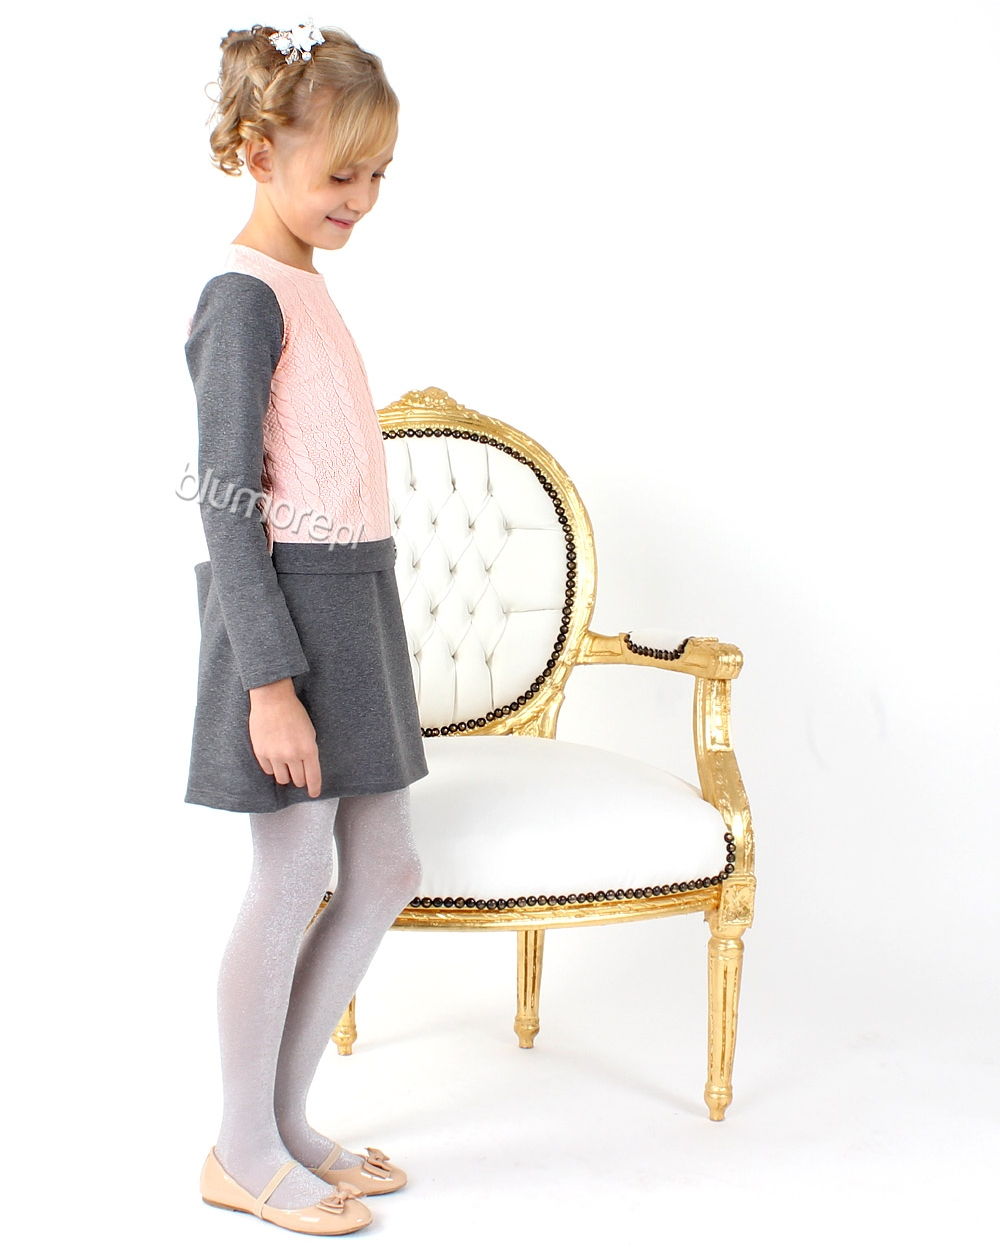 Sukienka prosta i elegancka 104 - 158 Marika szary + róż